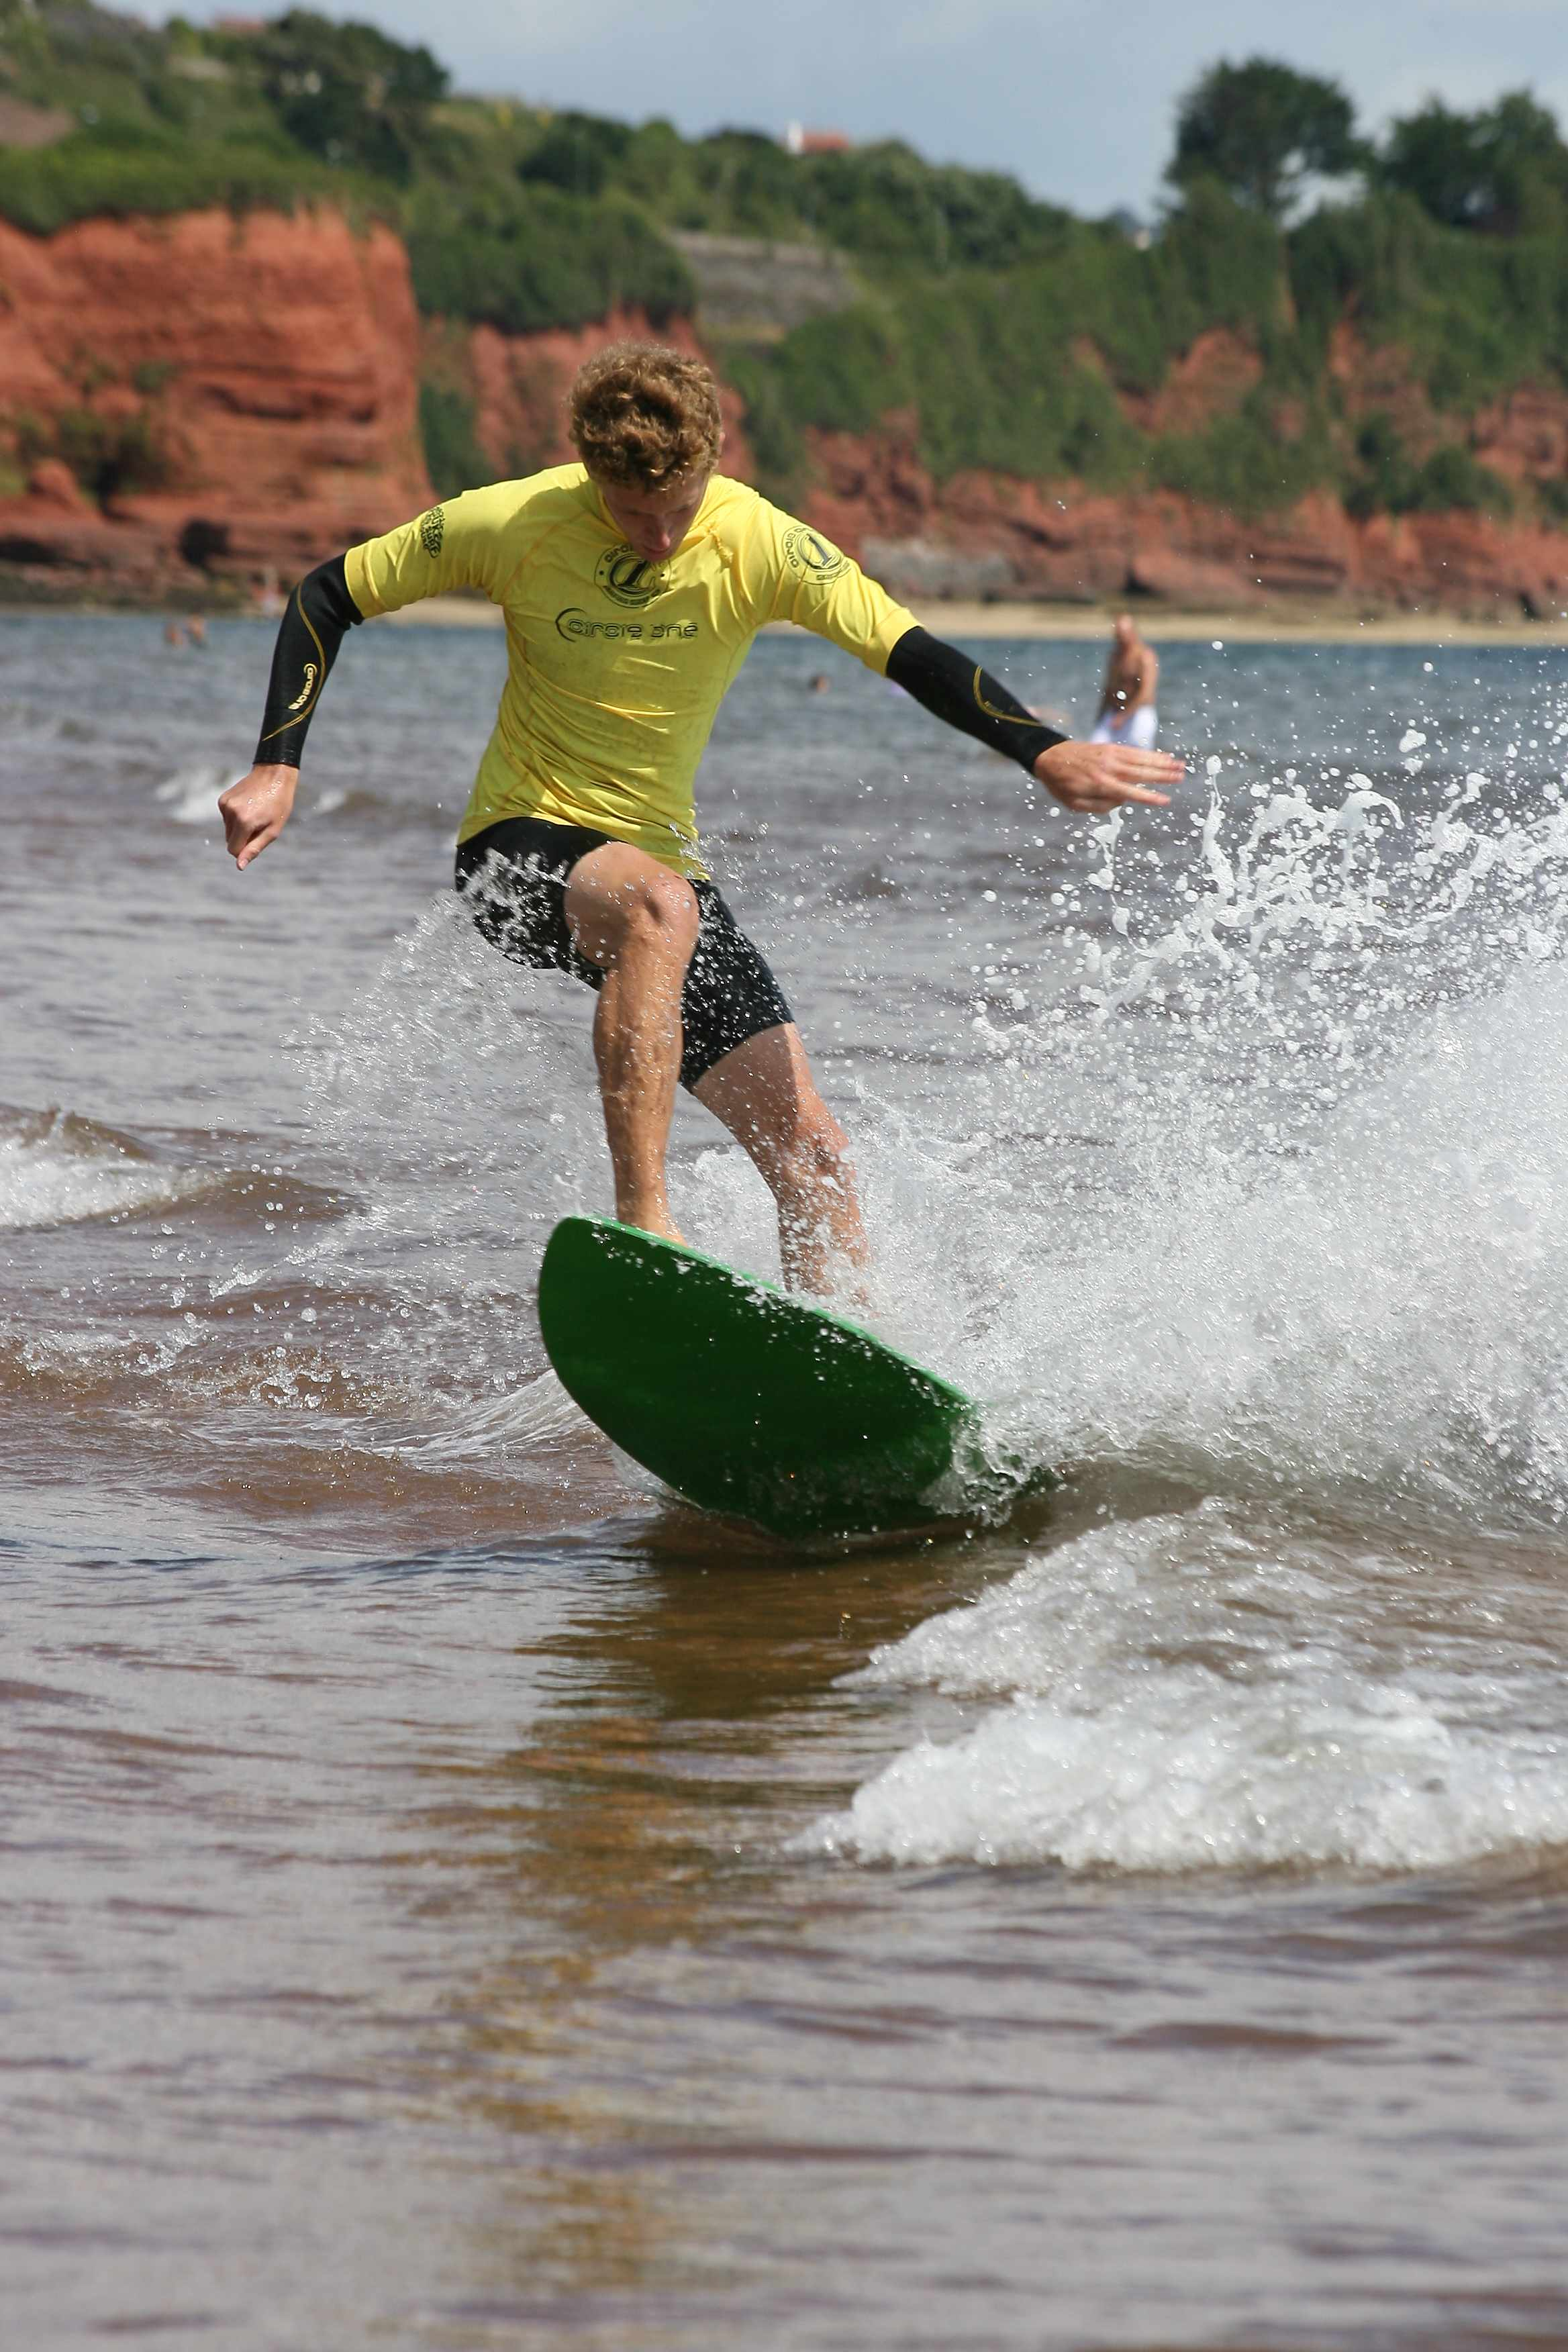 ollie bowen skimboarding sport south devon preston